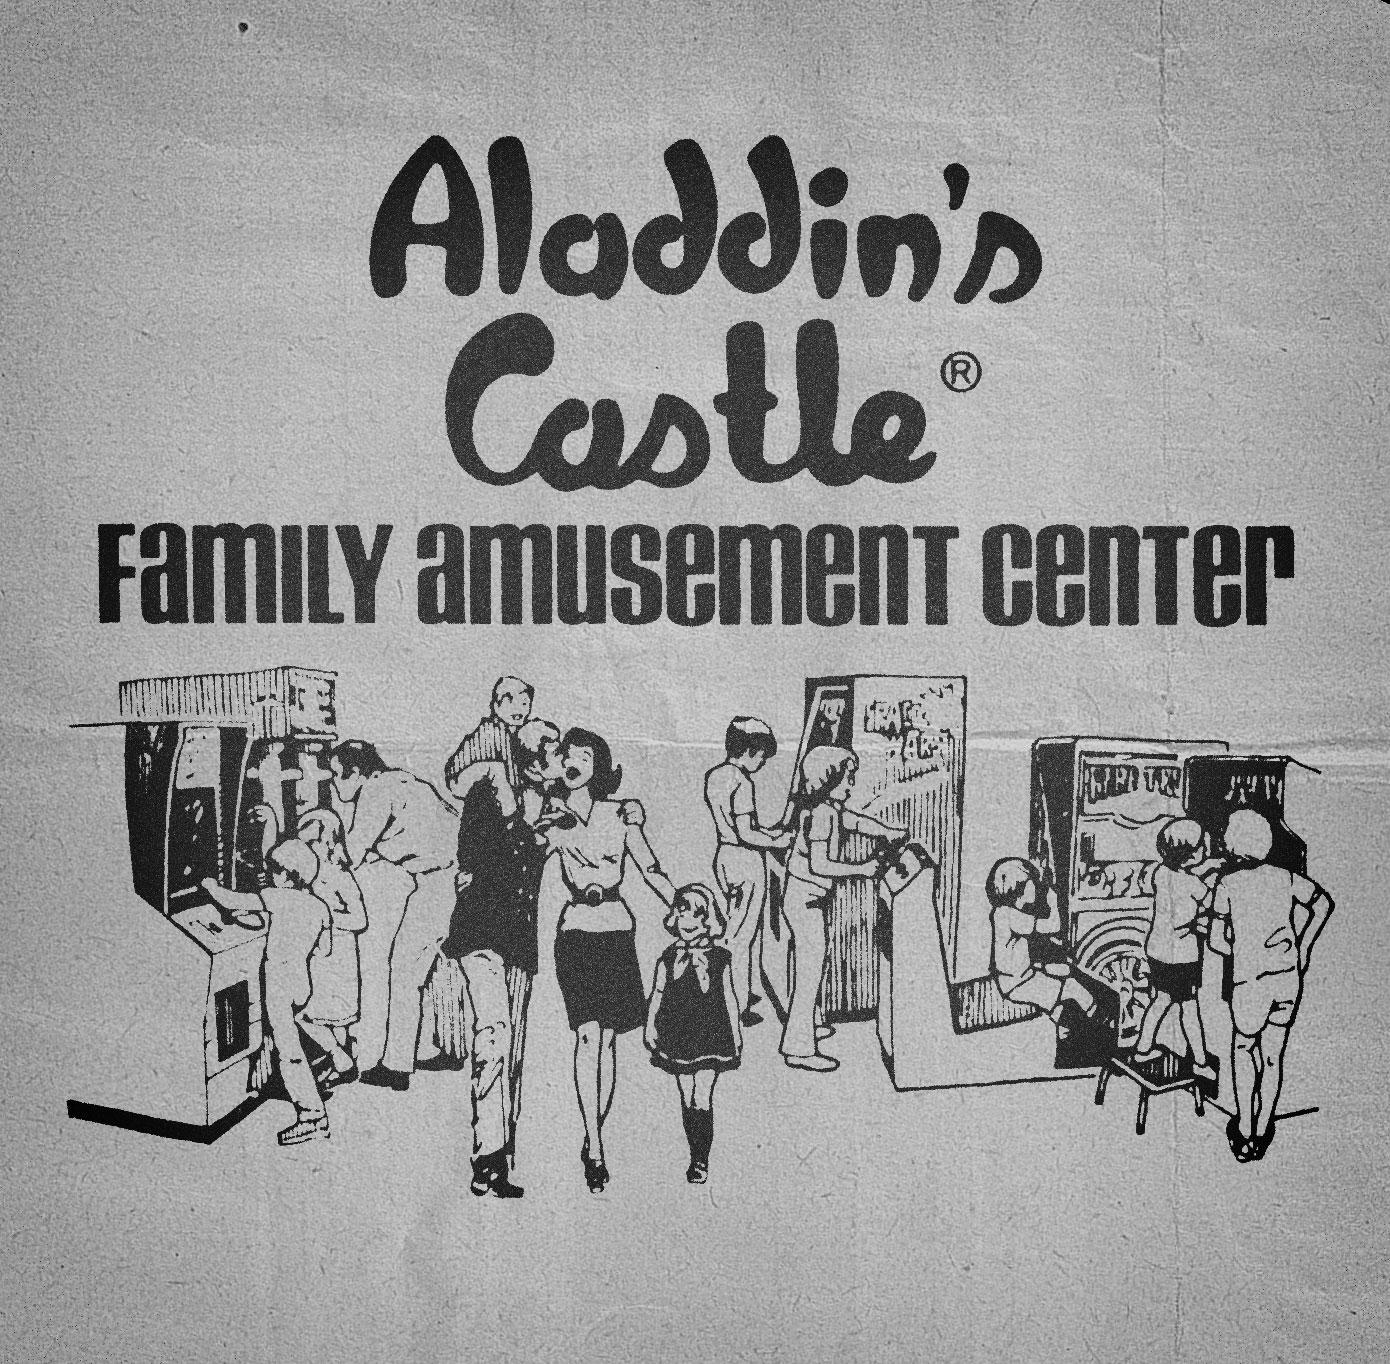 Aladdins Castle Ad